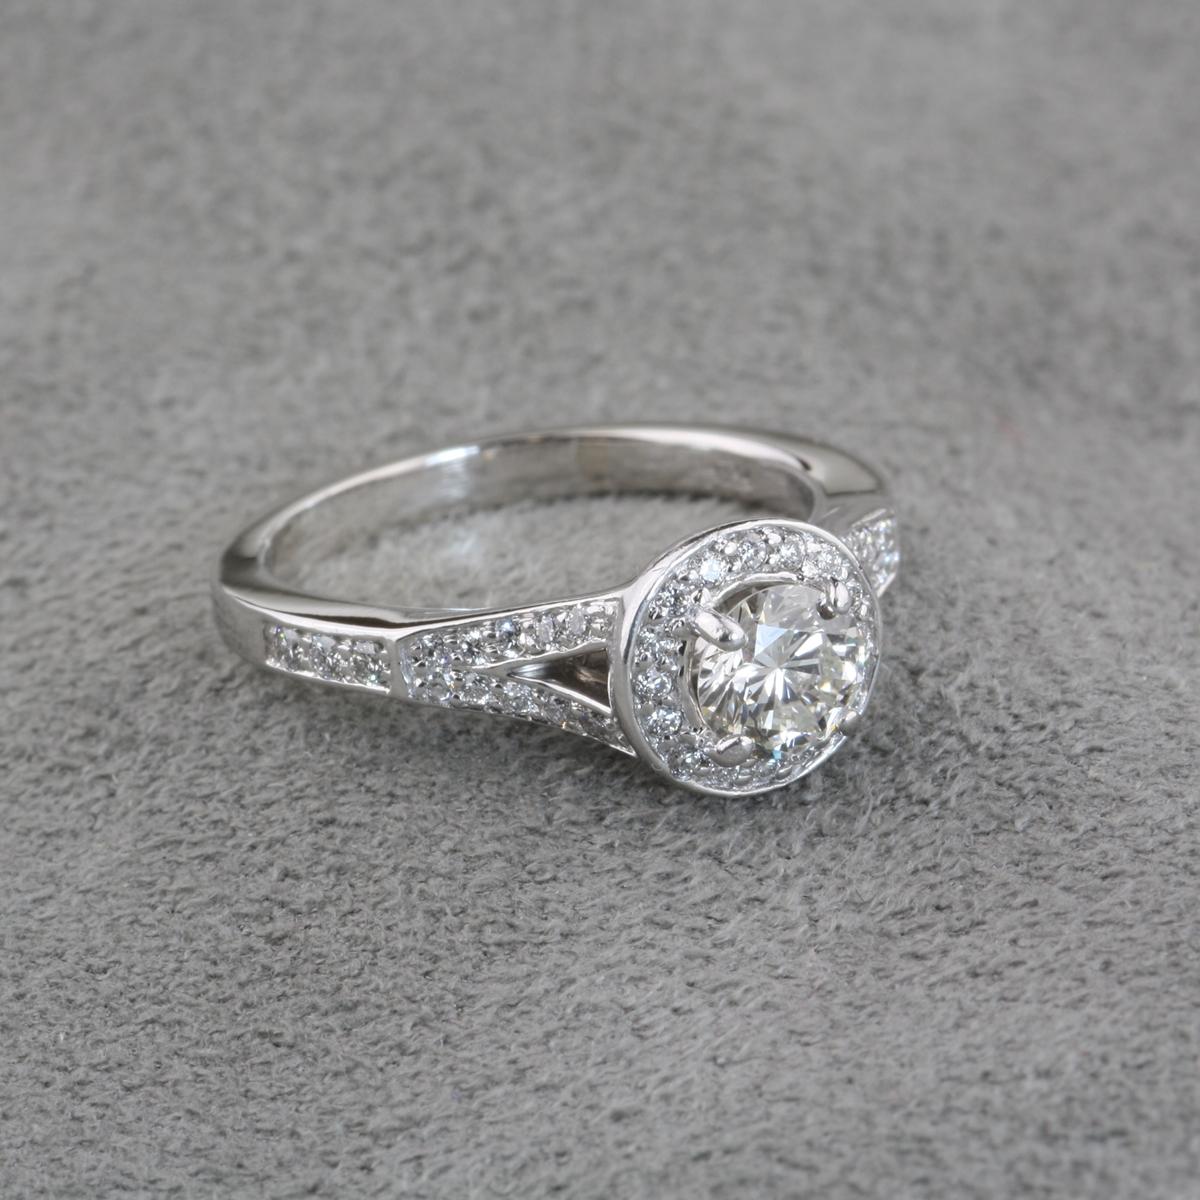 Preowned Diamond Halo Engagement Ring. Mountain Inspired Wedding Wedding Rings. Titanium Alloy Wedding Rings. Alphabet Wedding Rings. Toronto Blue Jays Rings. $4 Million Engagement Rings. Teak Rings. Blank Wedding Rings. Miabella Wedding Rings